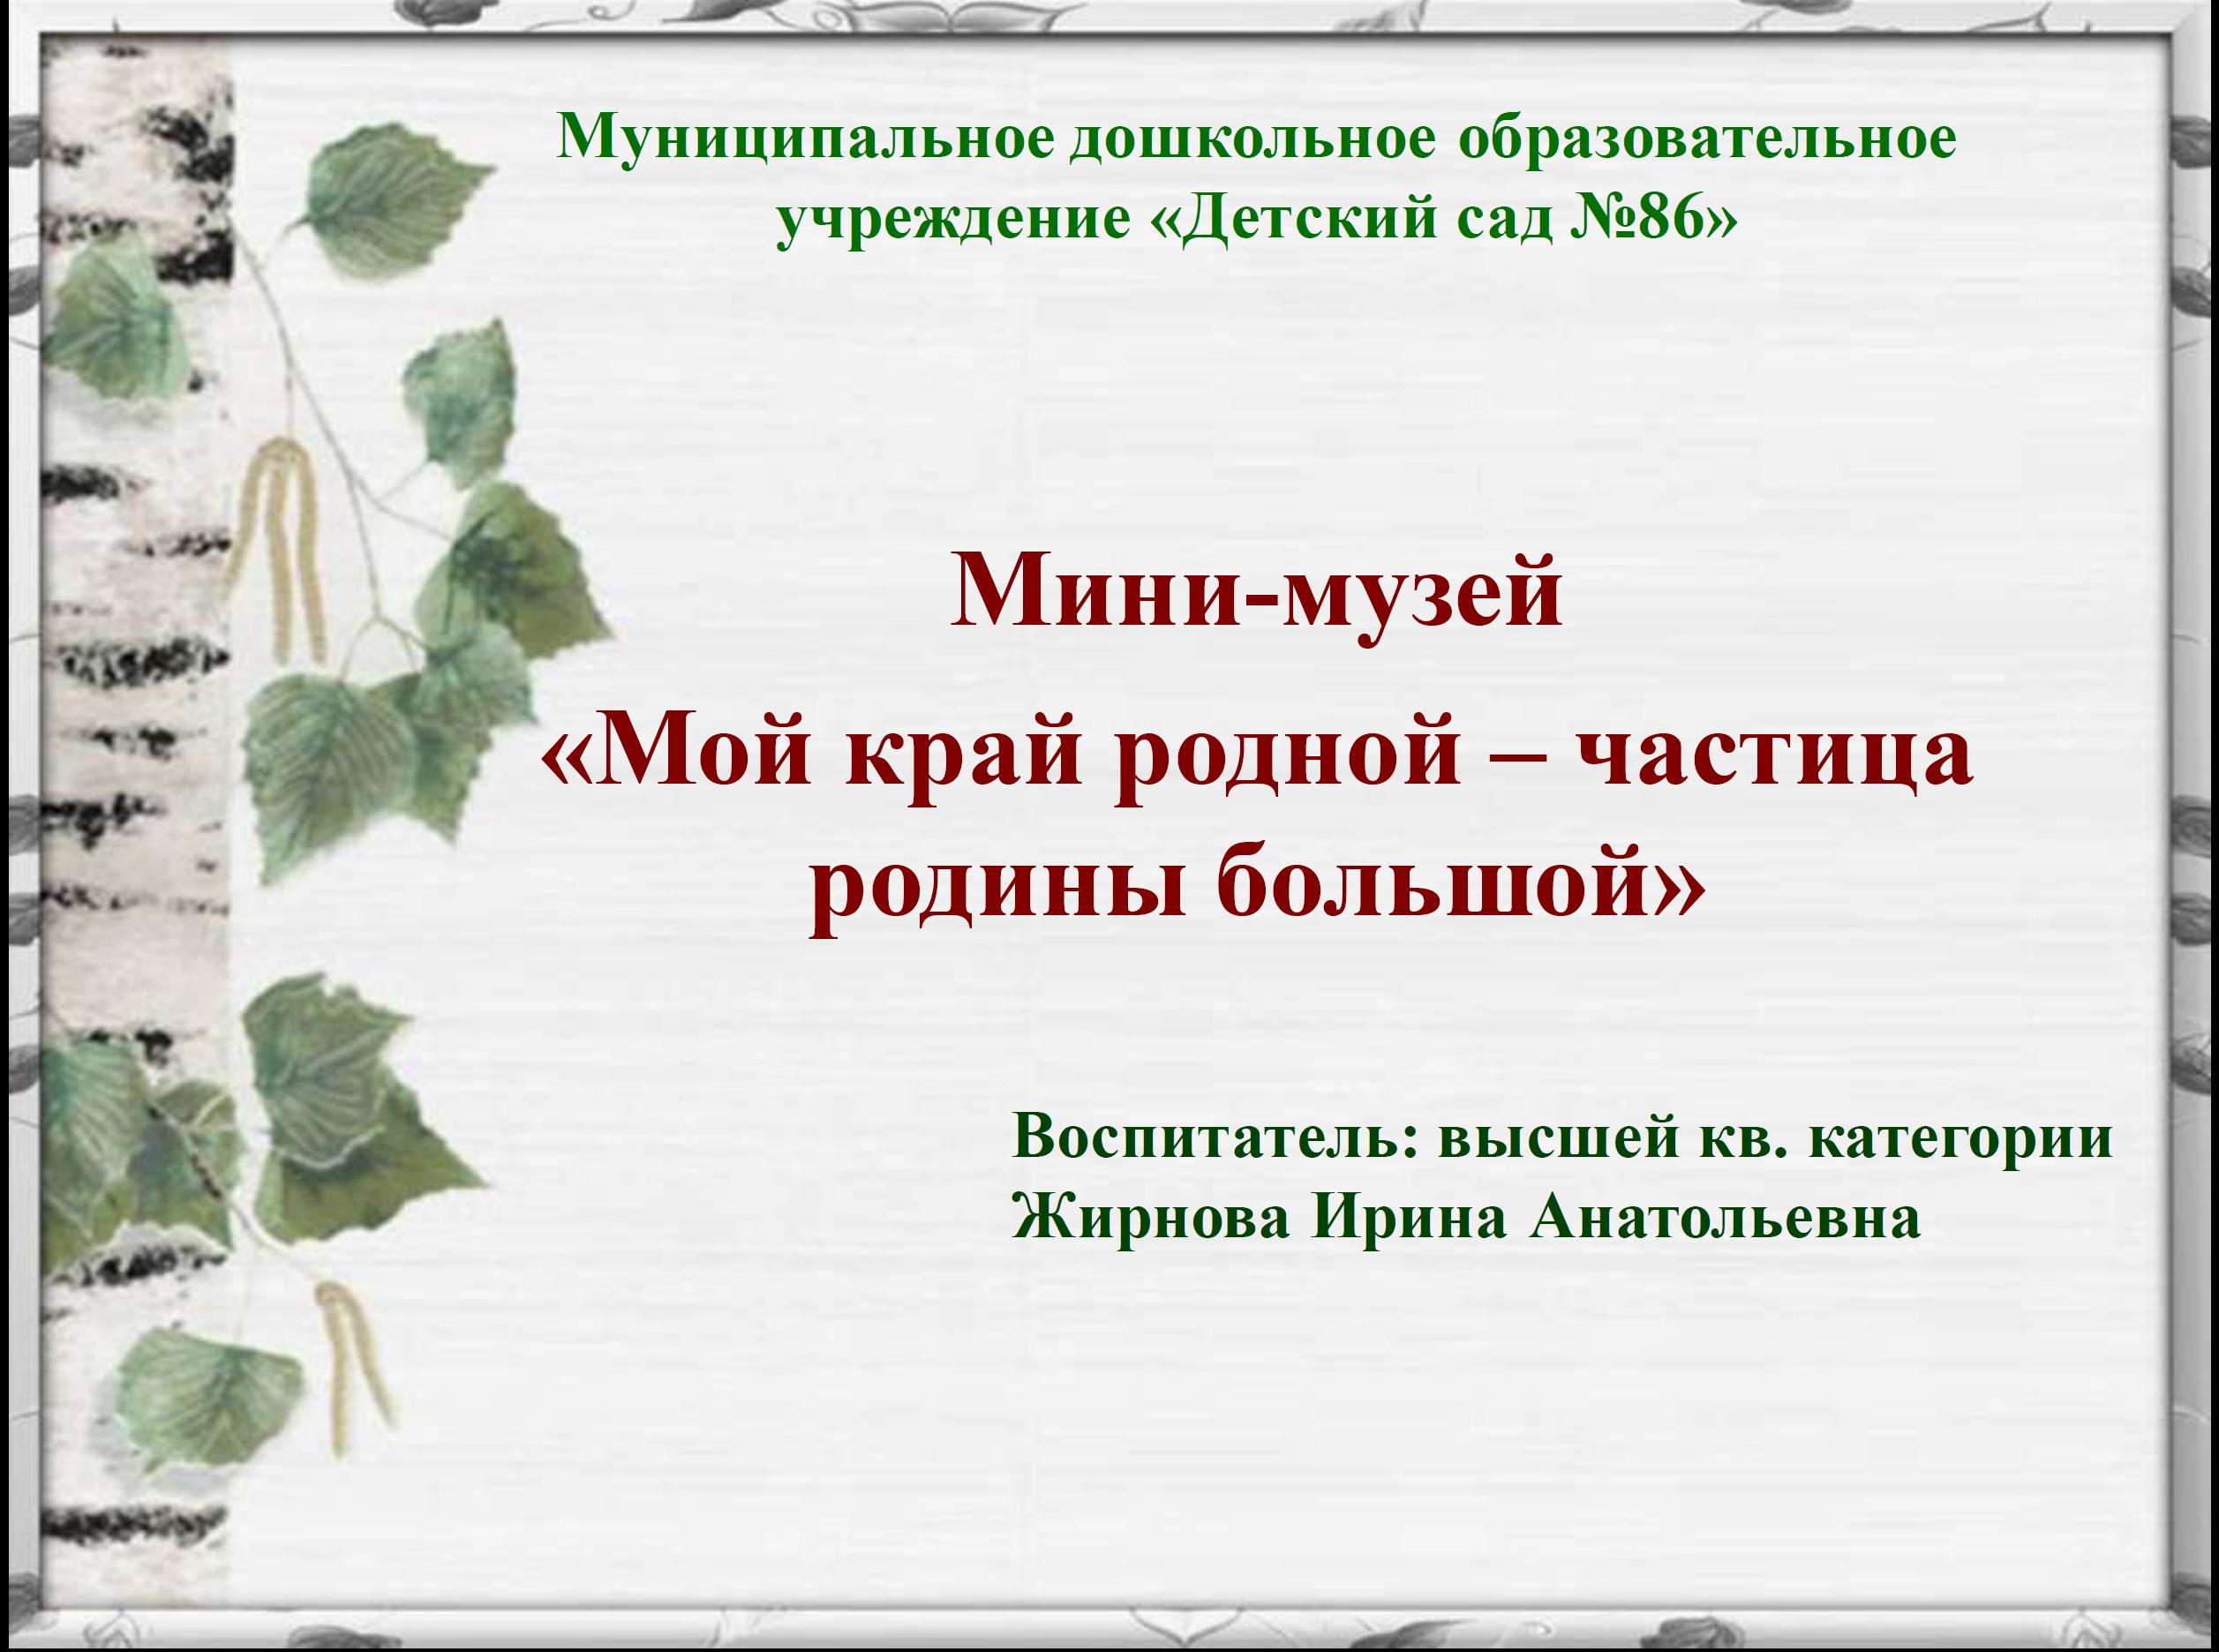 Жирнова Ирина Анатольевна 1